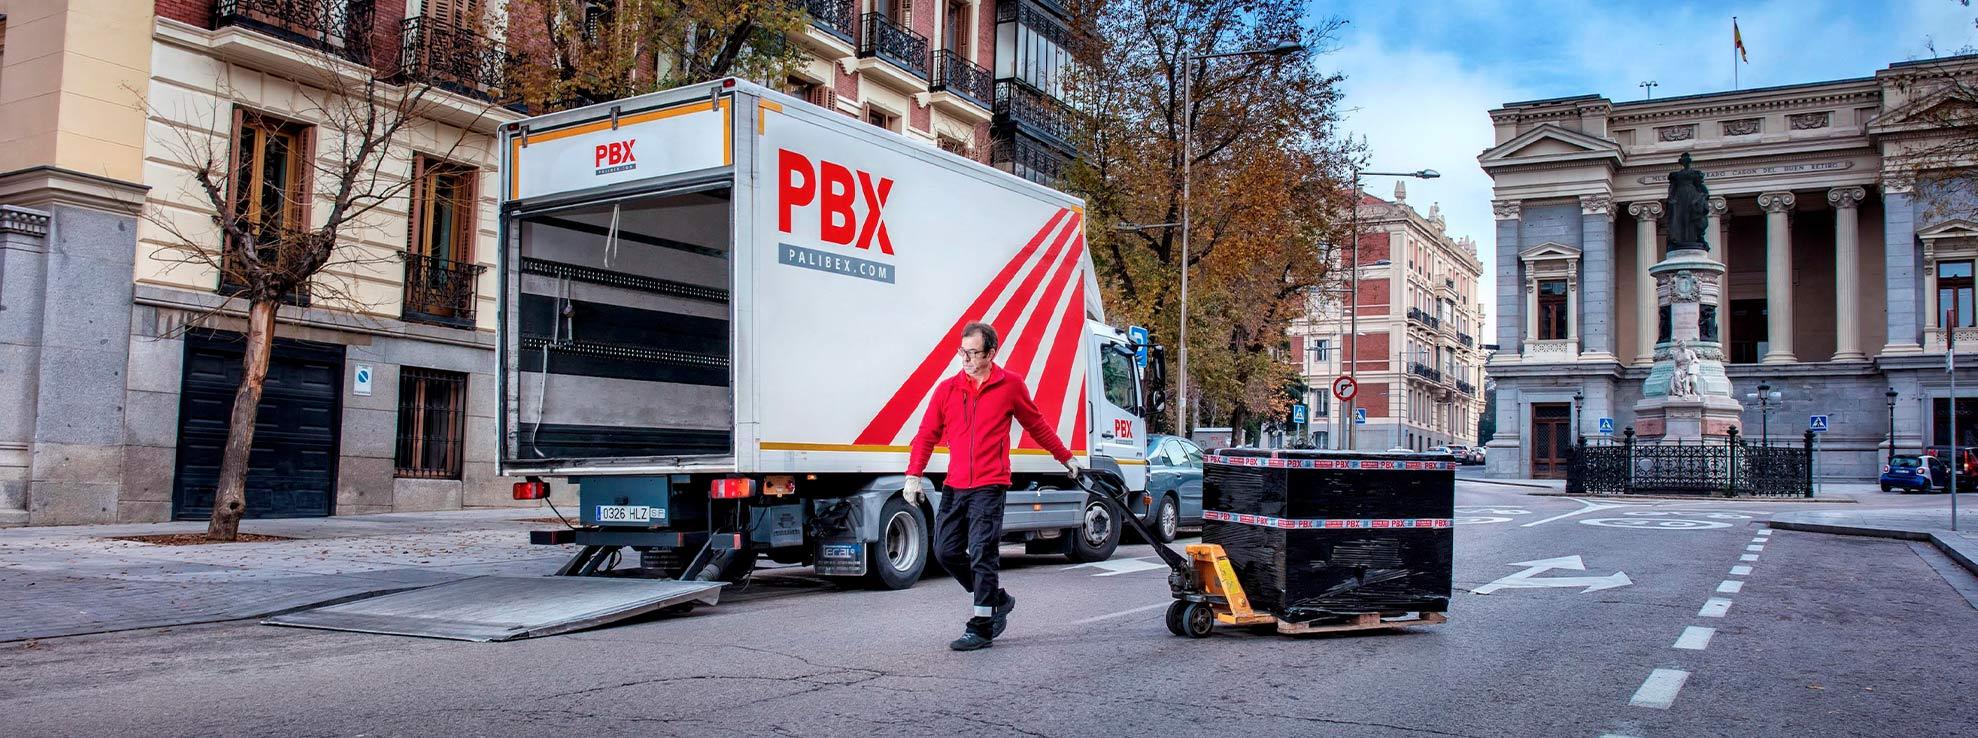 Transporte palés 2020- palibex - repartidor palé